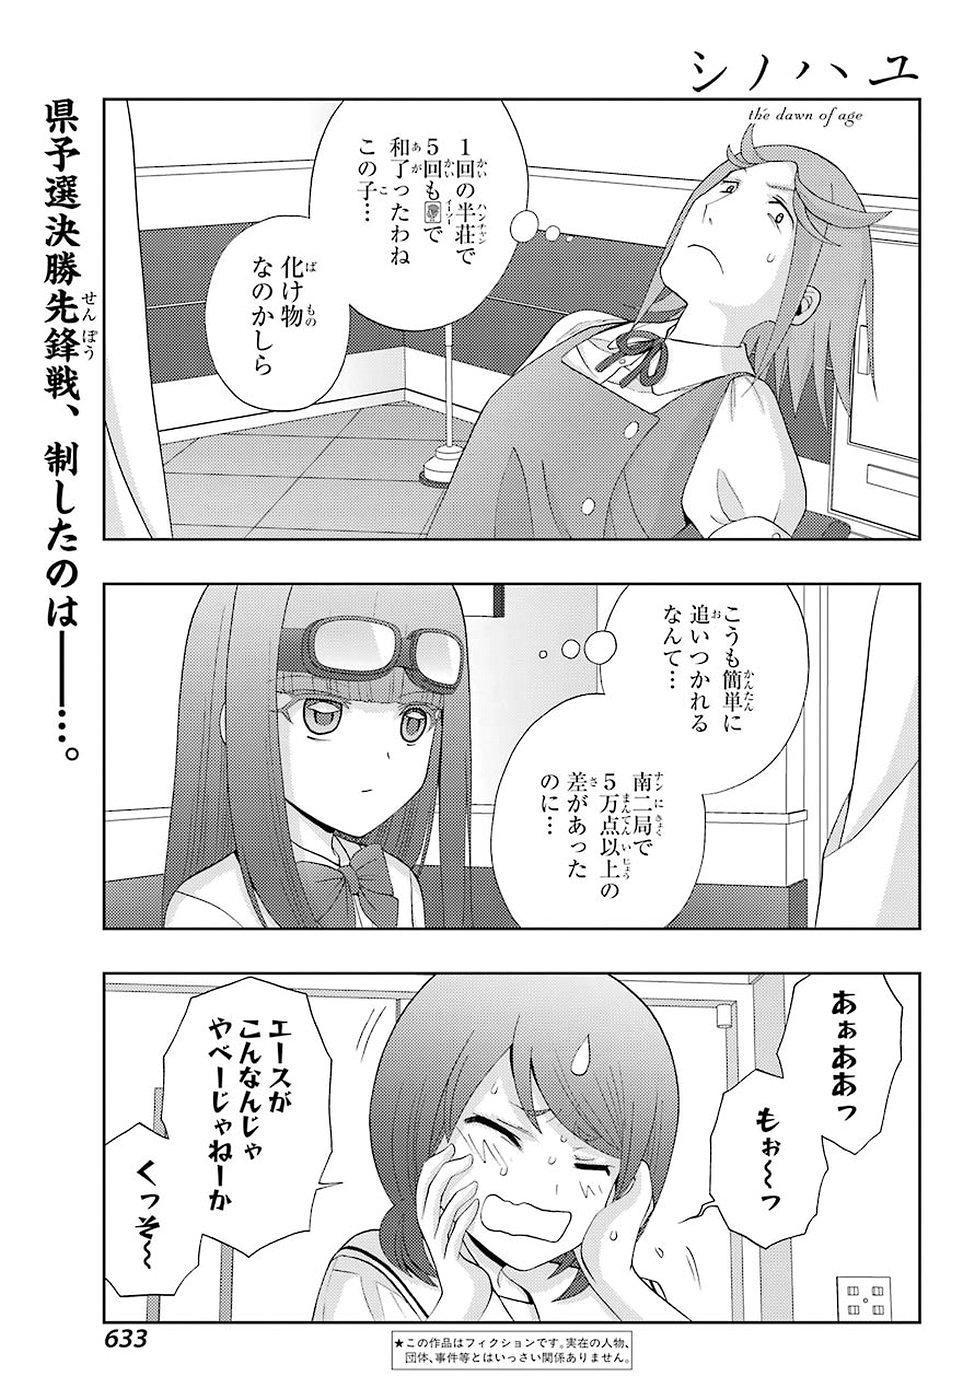 Shinohayu - The Dawn of Age Manga - Chapter 047 - Page 1